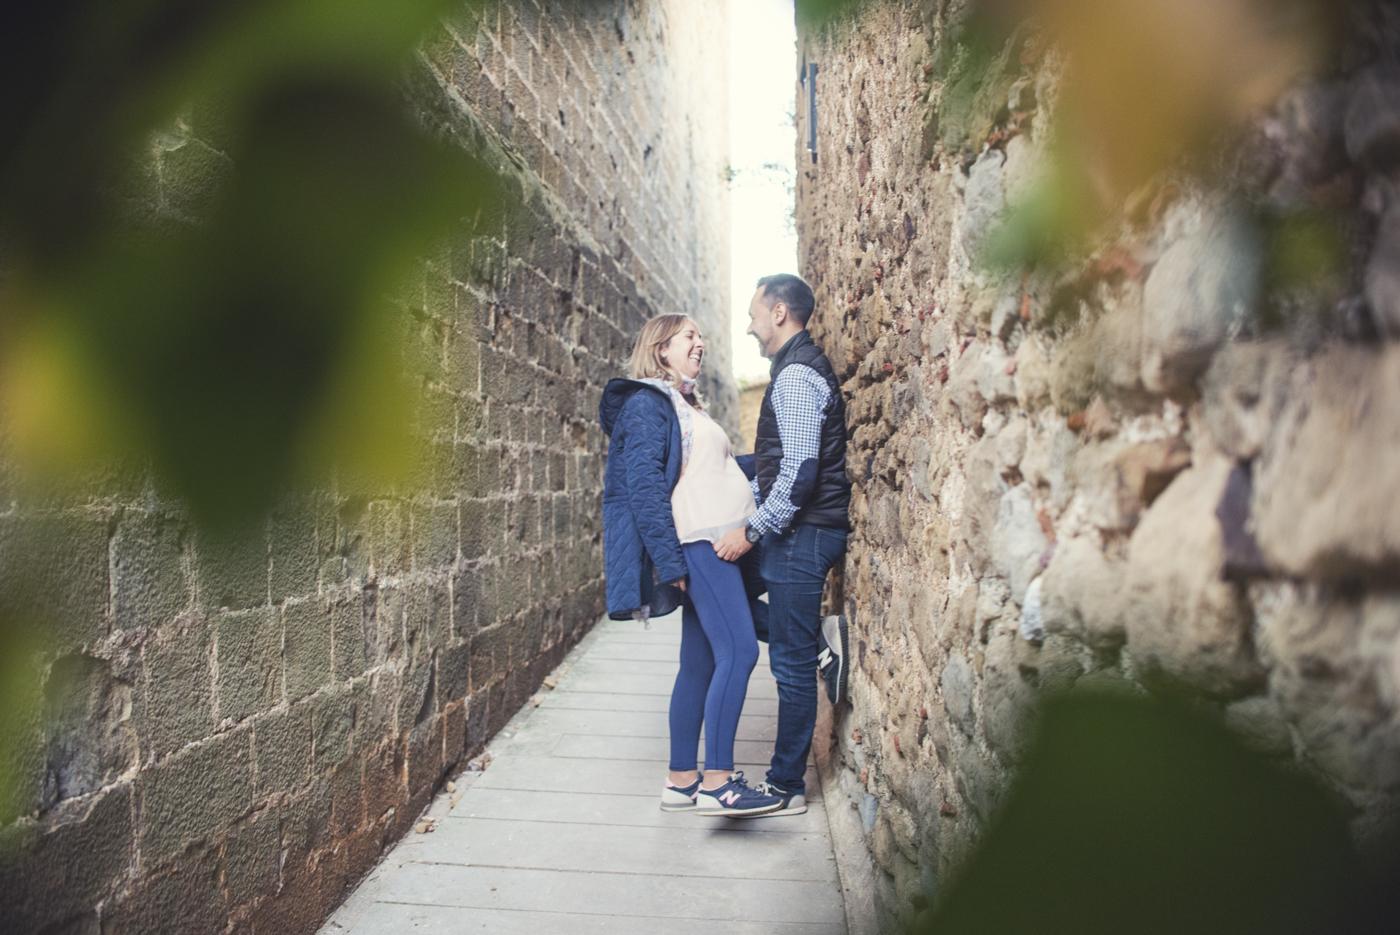 portfolio-fotos-embarazo-mia-moments-madremanya-cristina-jordi-06.jpg